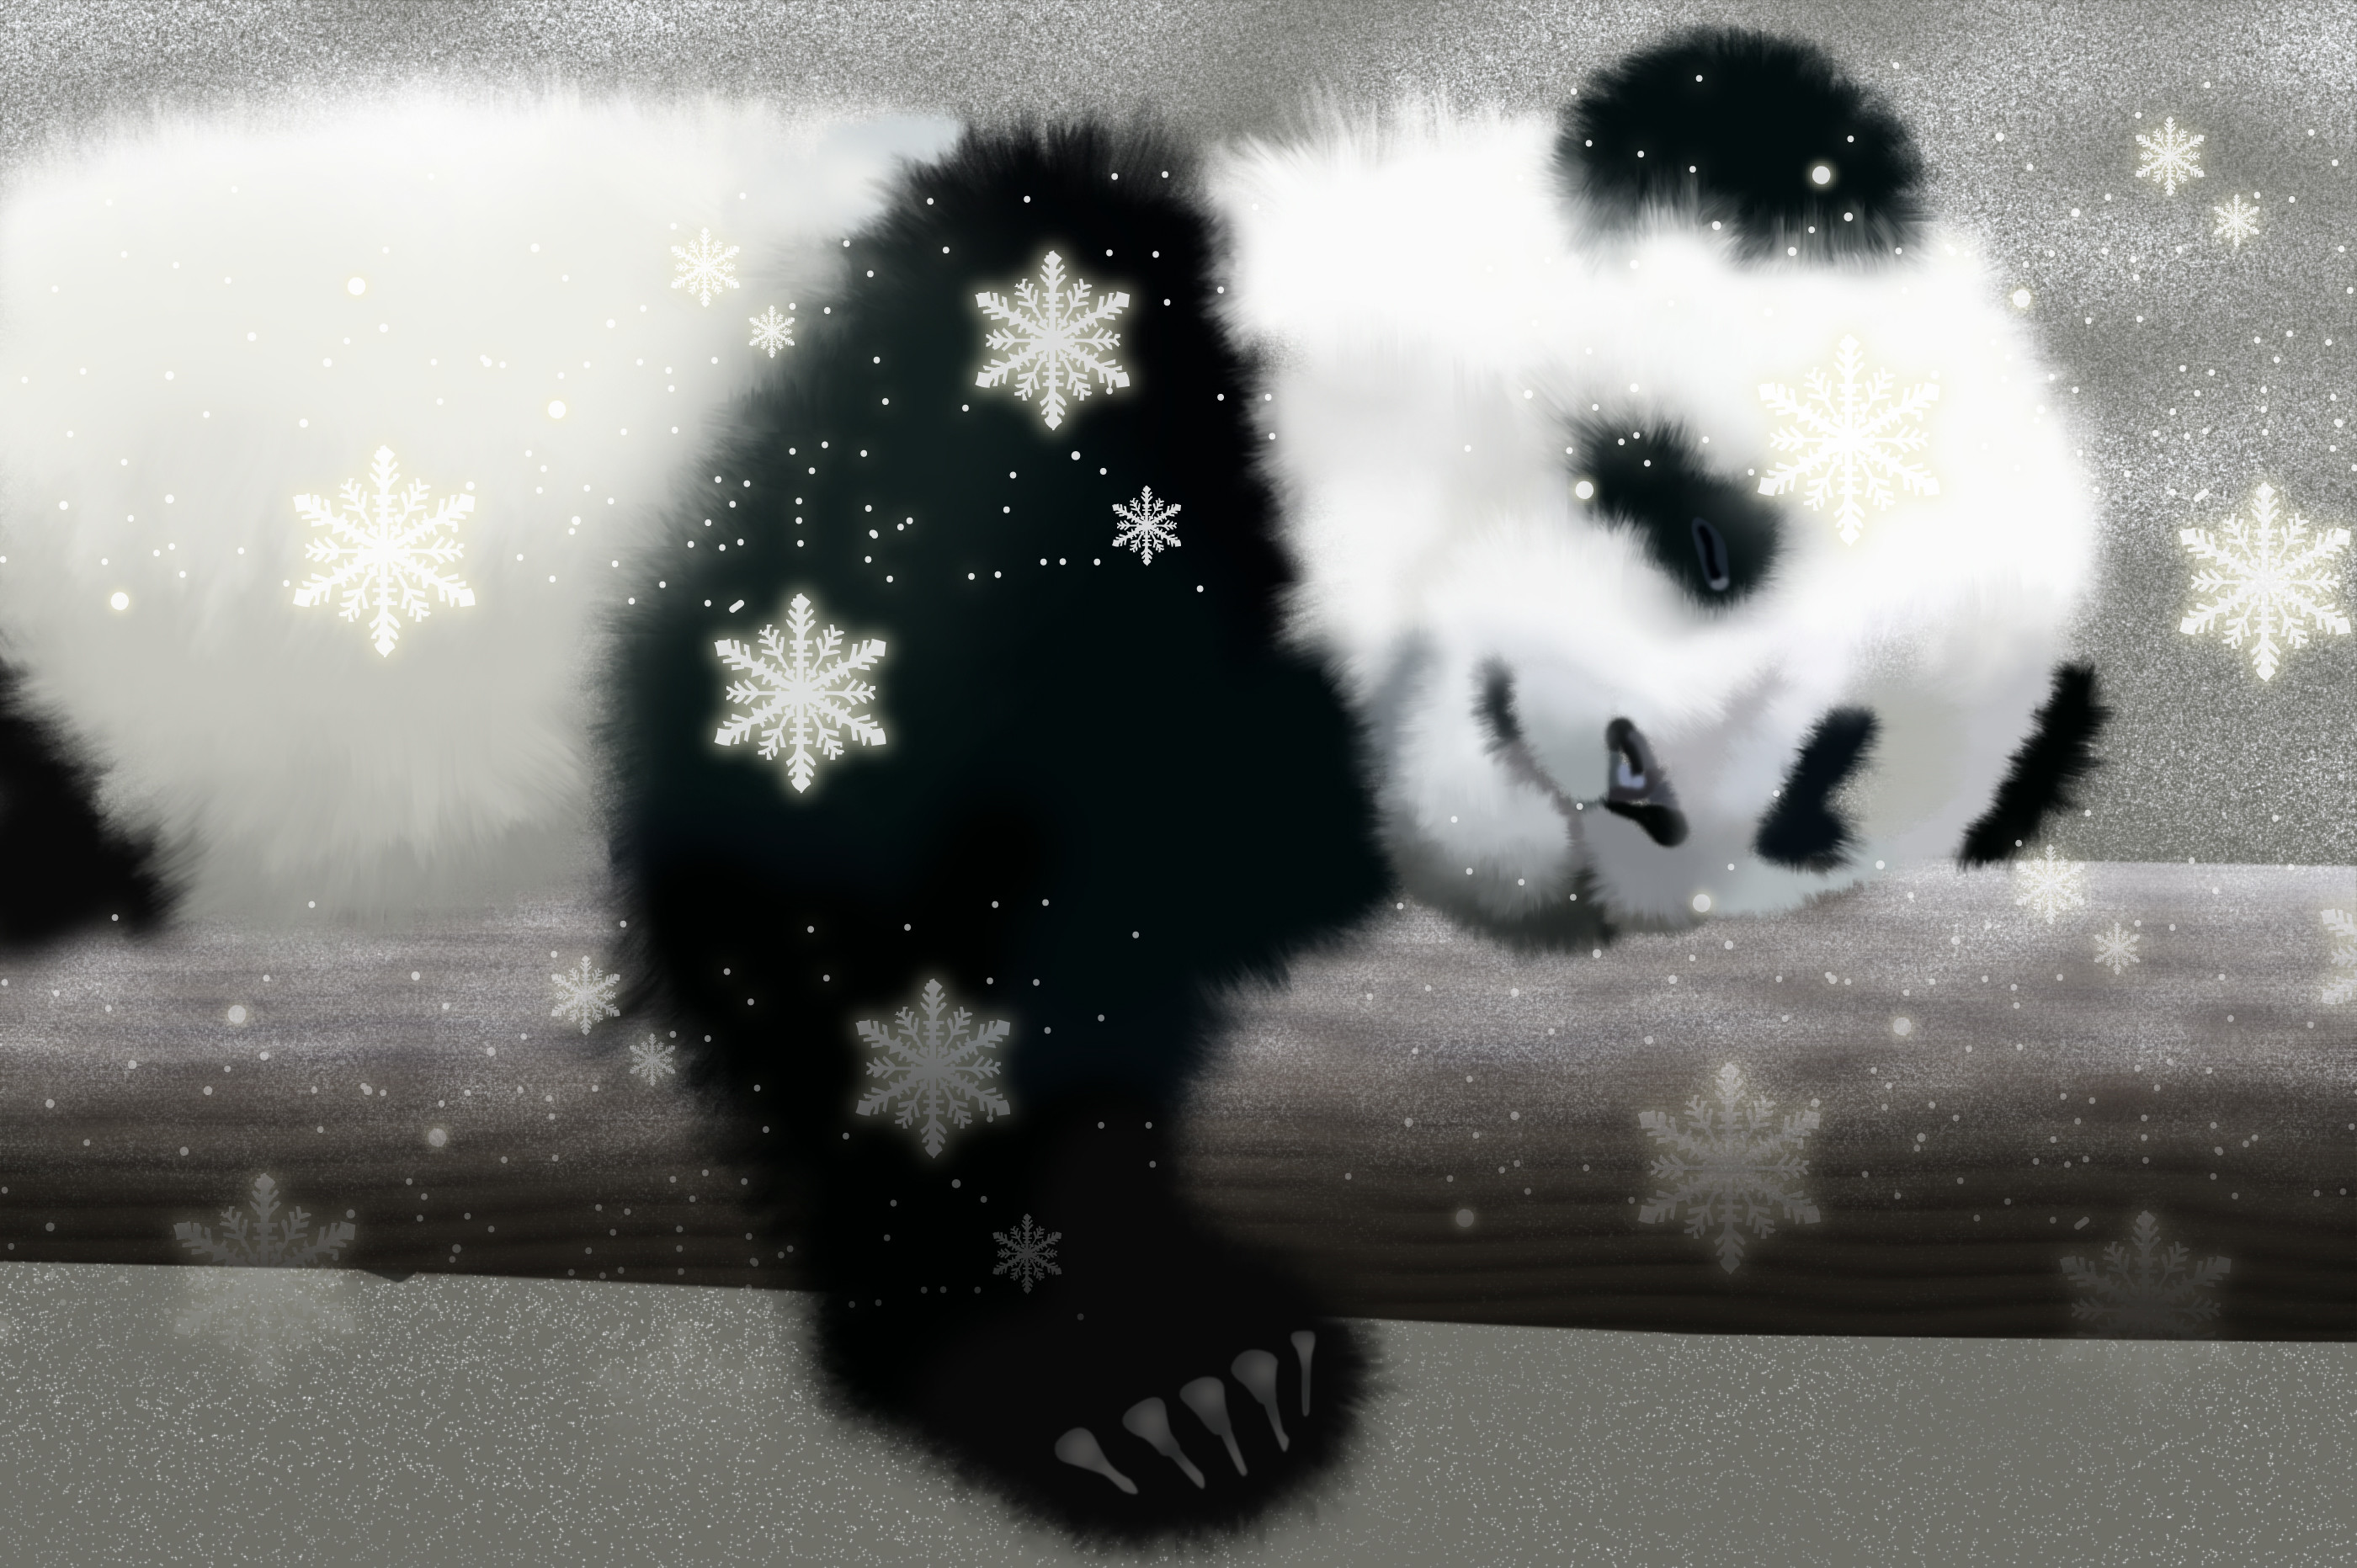 Res: 2800x1863, URL httpbackground picturesfeedionetcute panda wallpapers